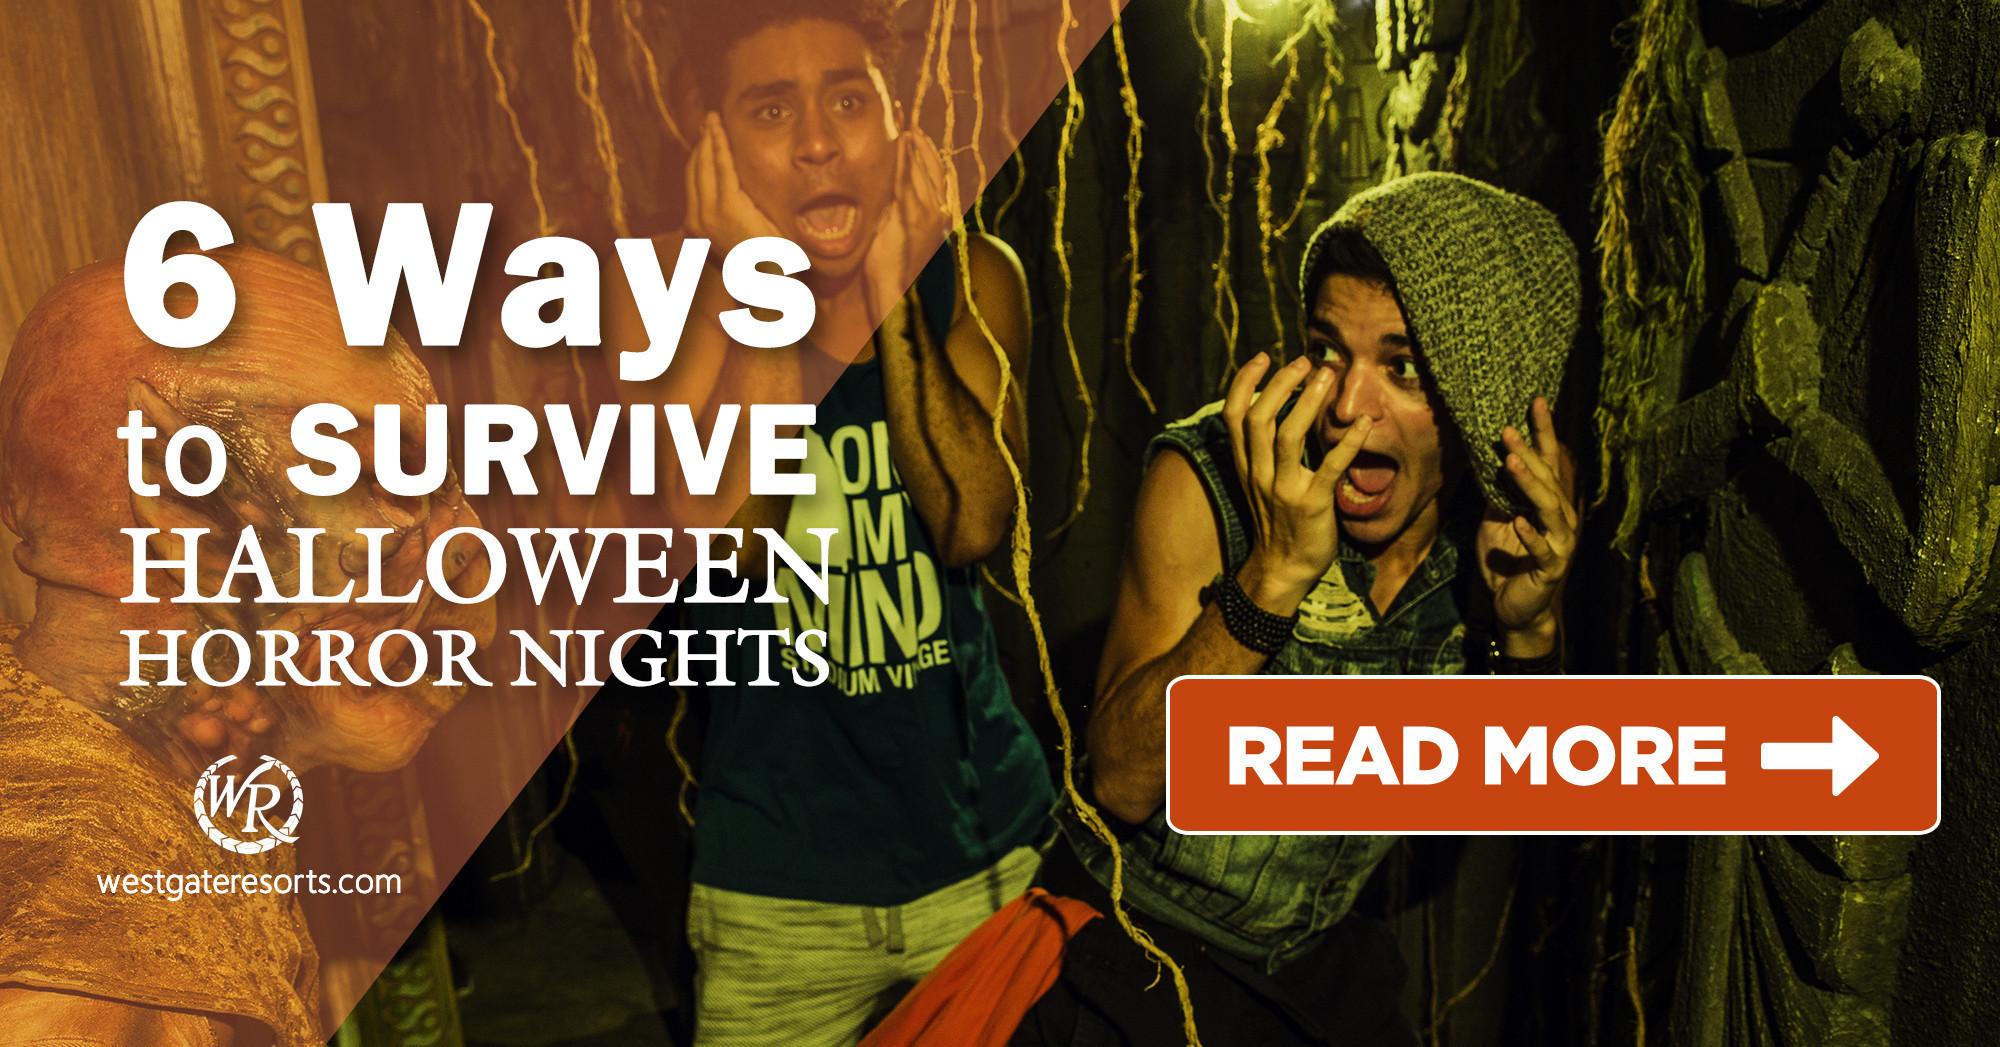 6 Ways to Survive Halloween Horror Nights Wait Times in Orlando for 2018 | Orlando Trip Guide | Westgate Orlando Resorts